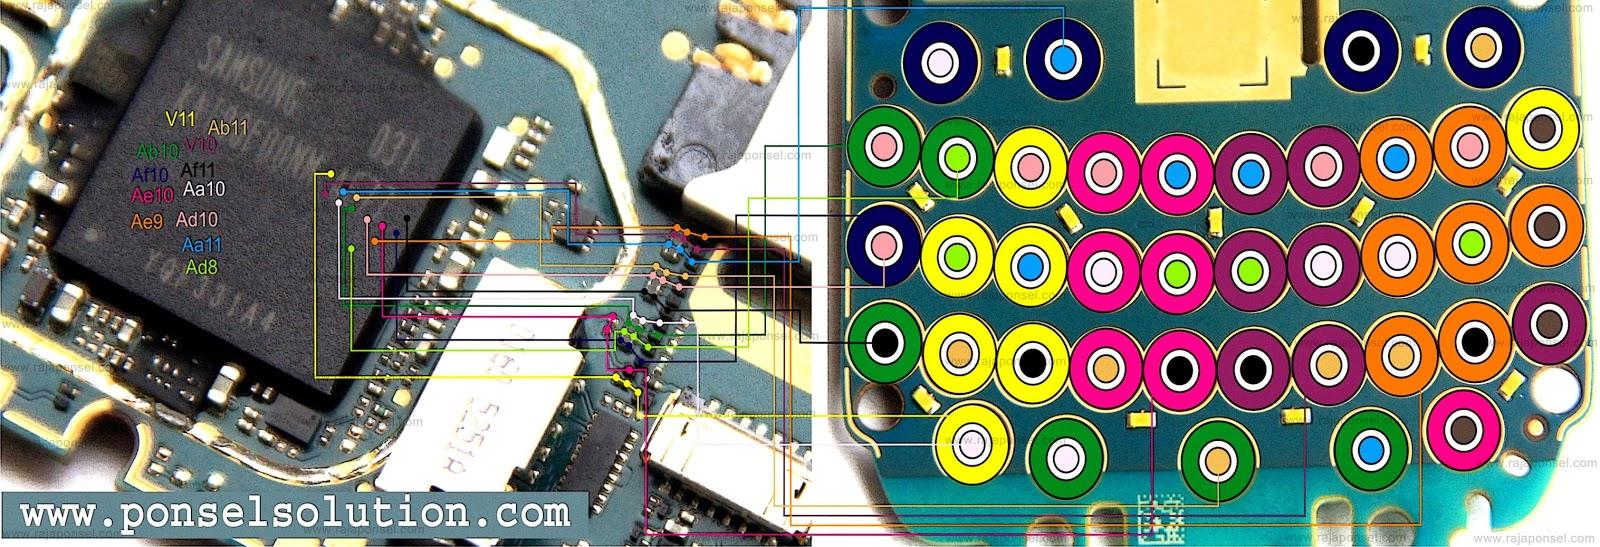 blackberry bold 9780 manual download